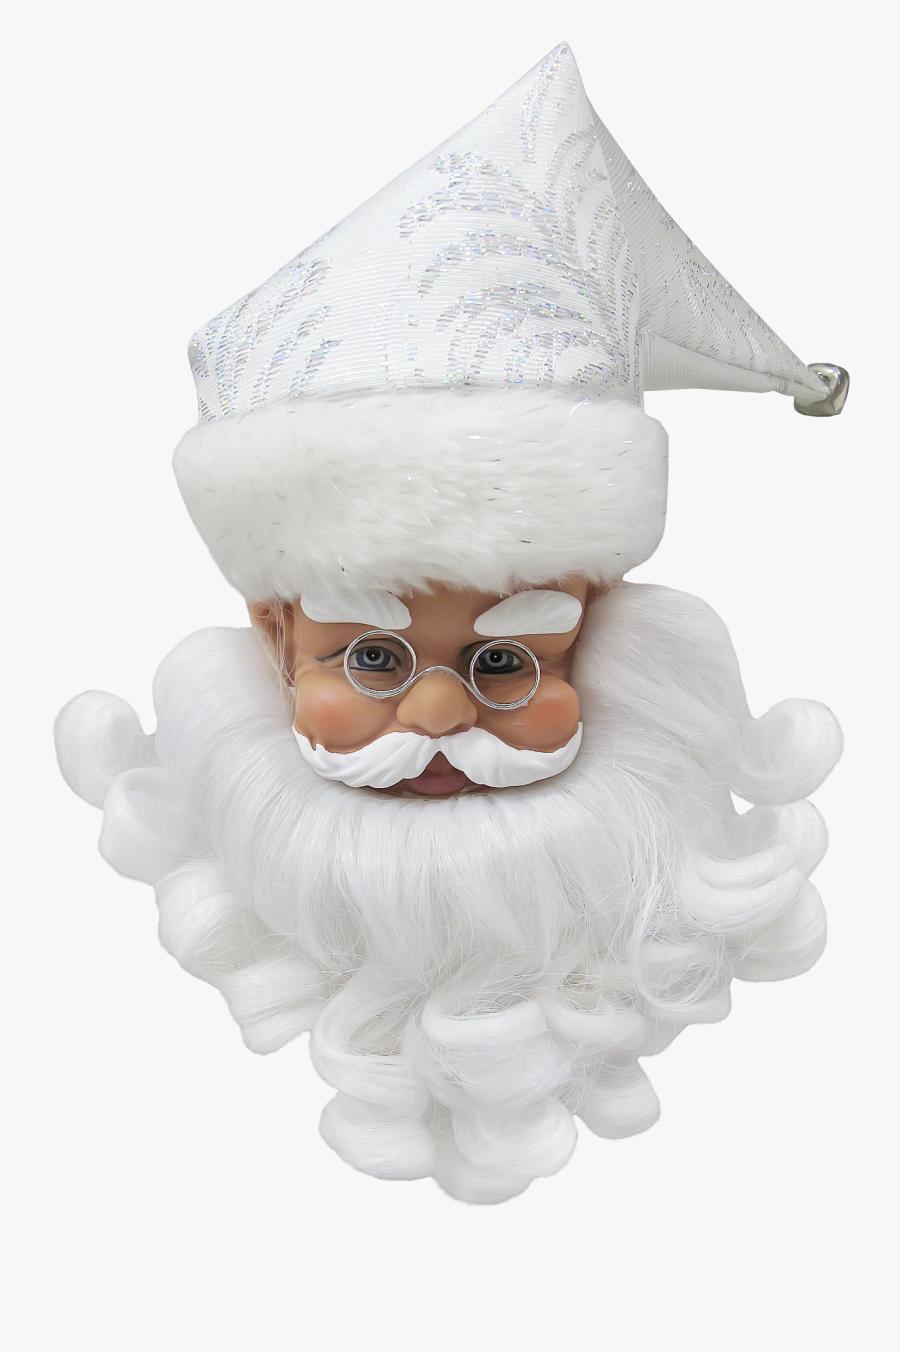 Santa Claus Beard Download Computer File - Santa Claus, Transparent Clipart